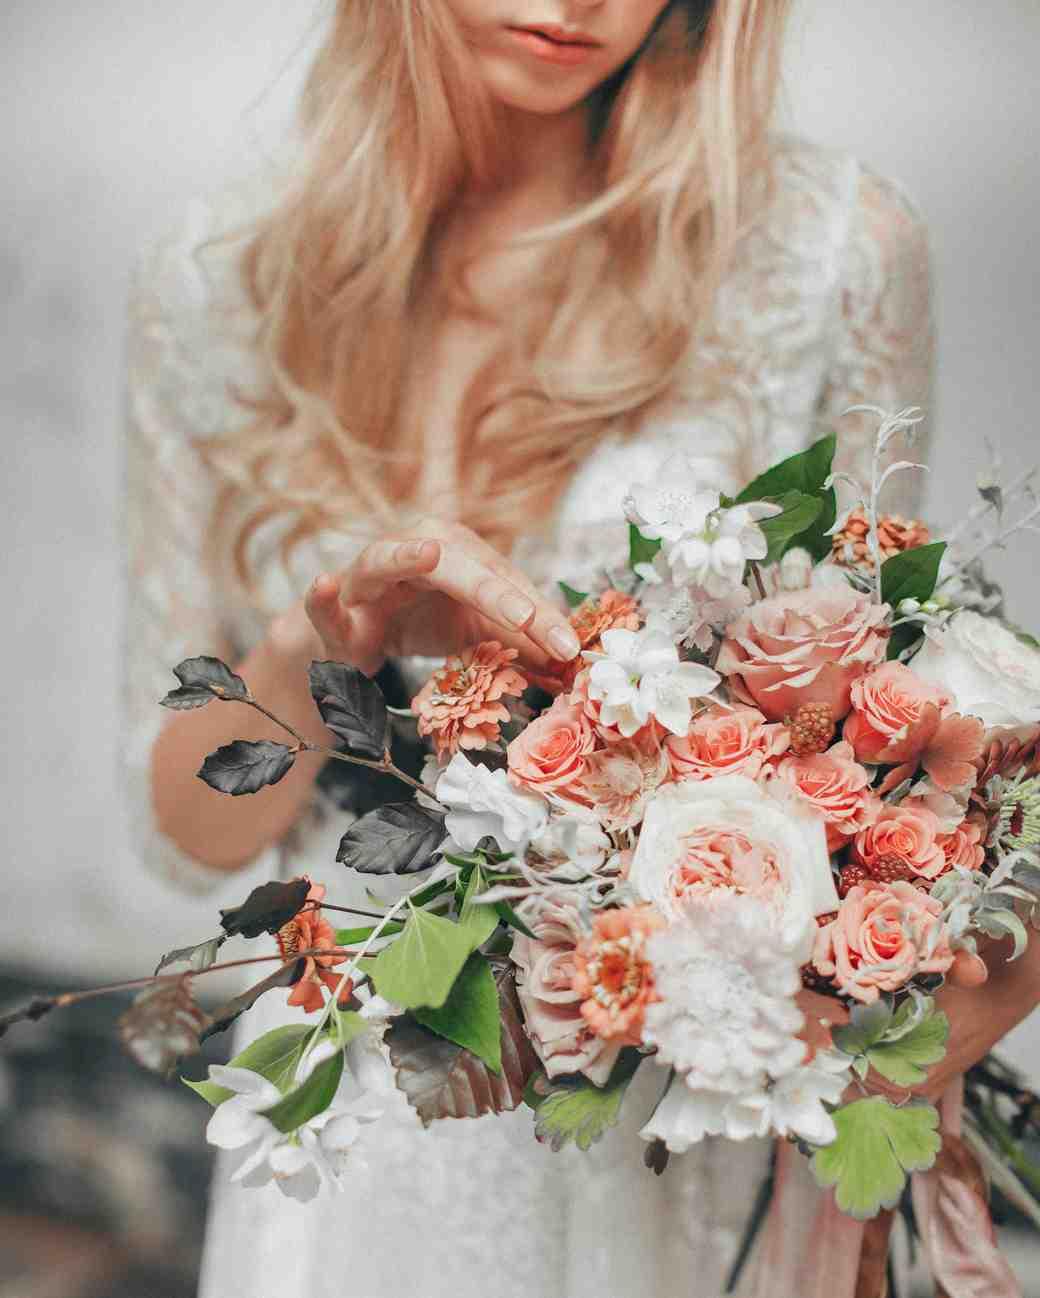 Wedding Flowers Autumn: 52 Gorgeous Fall Wedding Bouquets